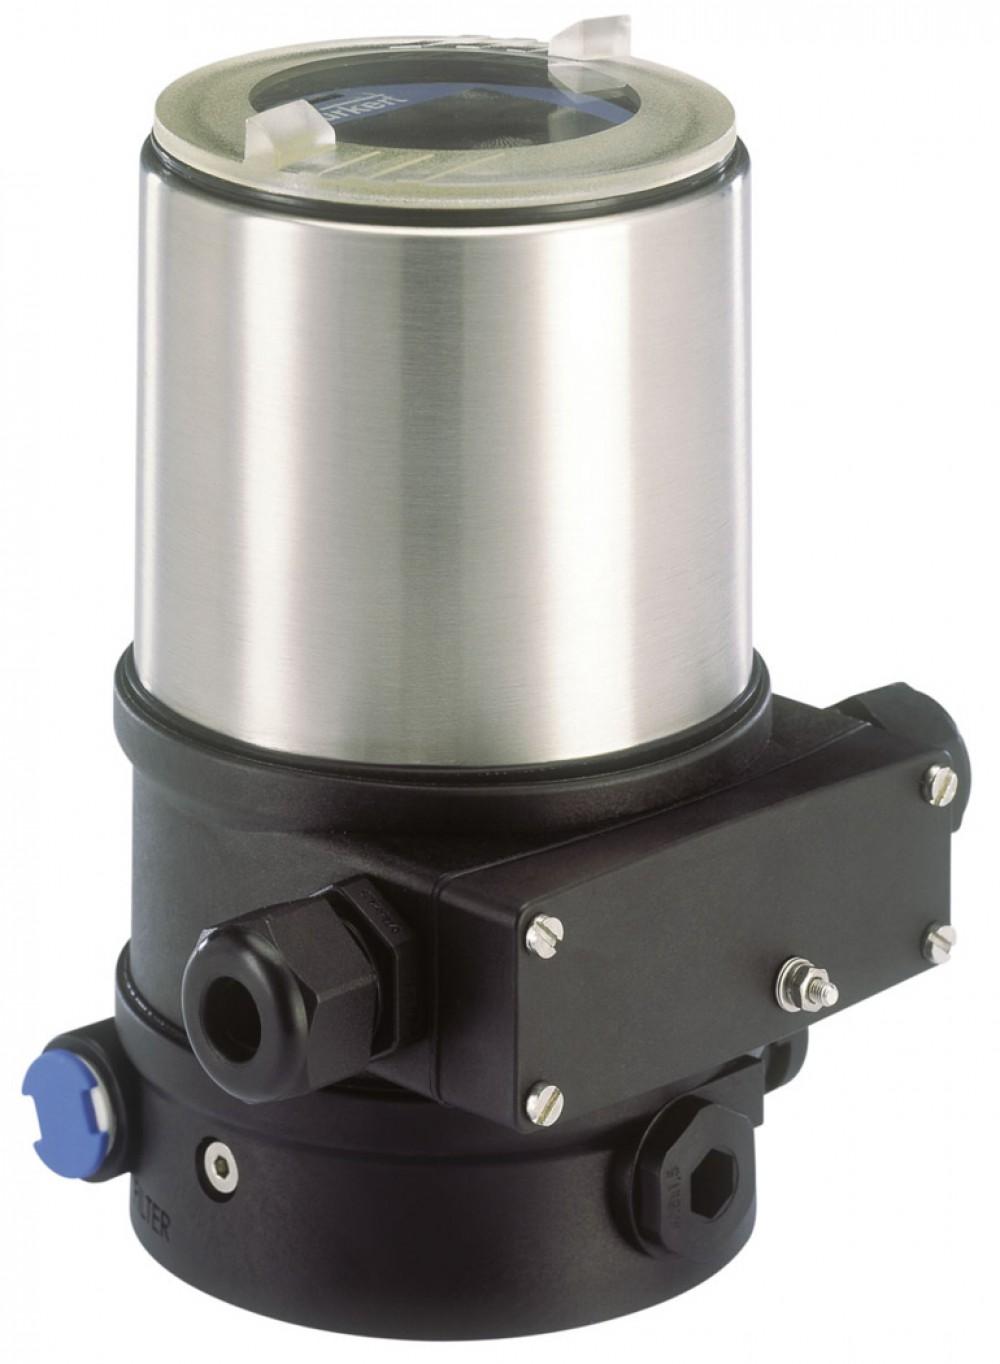 BURKERT TYPE 8693 - DIGITAL ELECTROPNUEMATIC PROCESS CONTROLLER